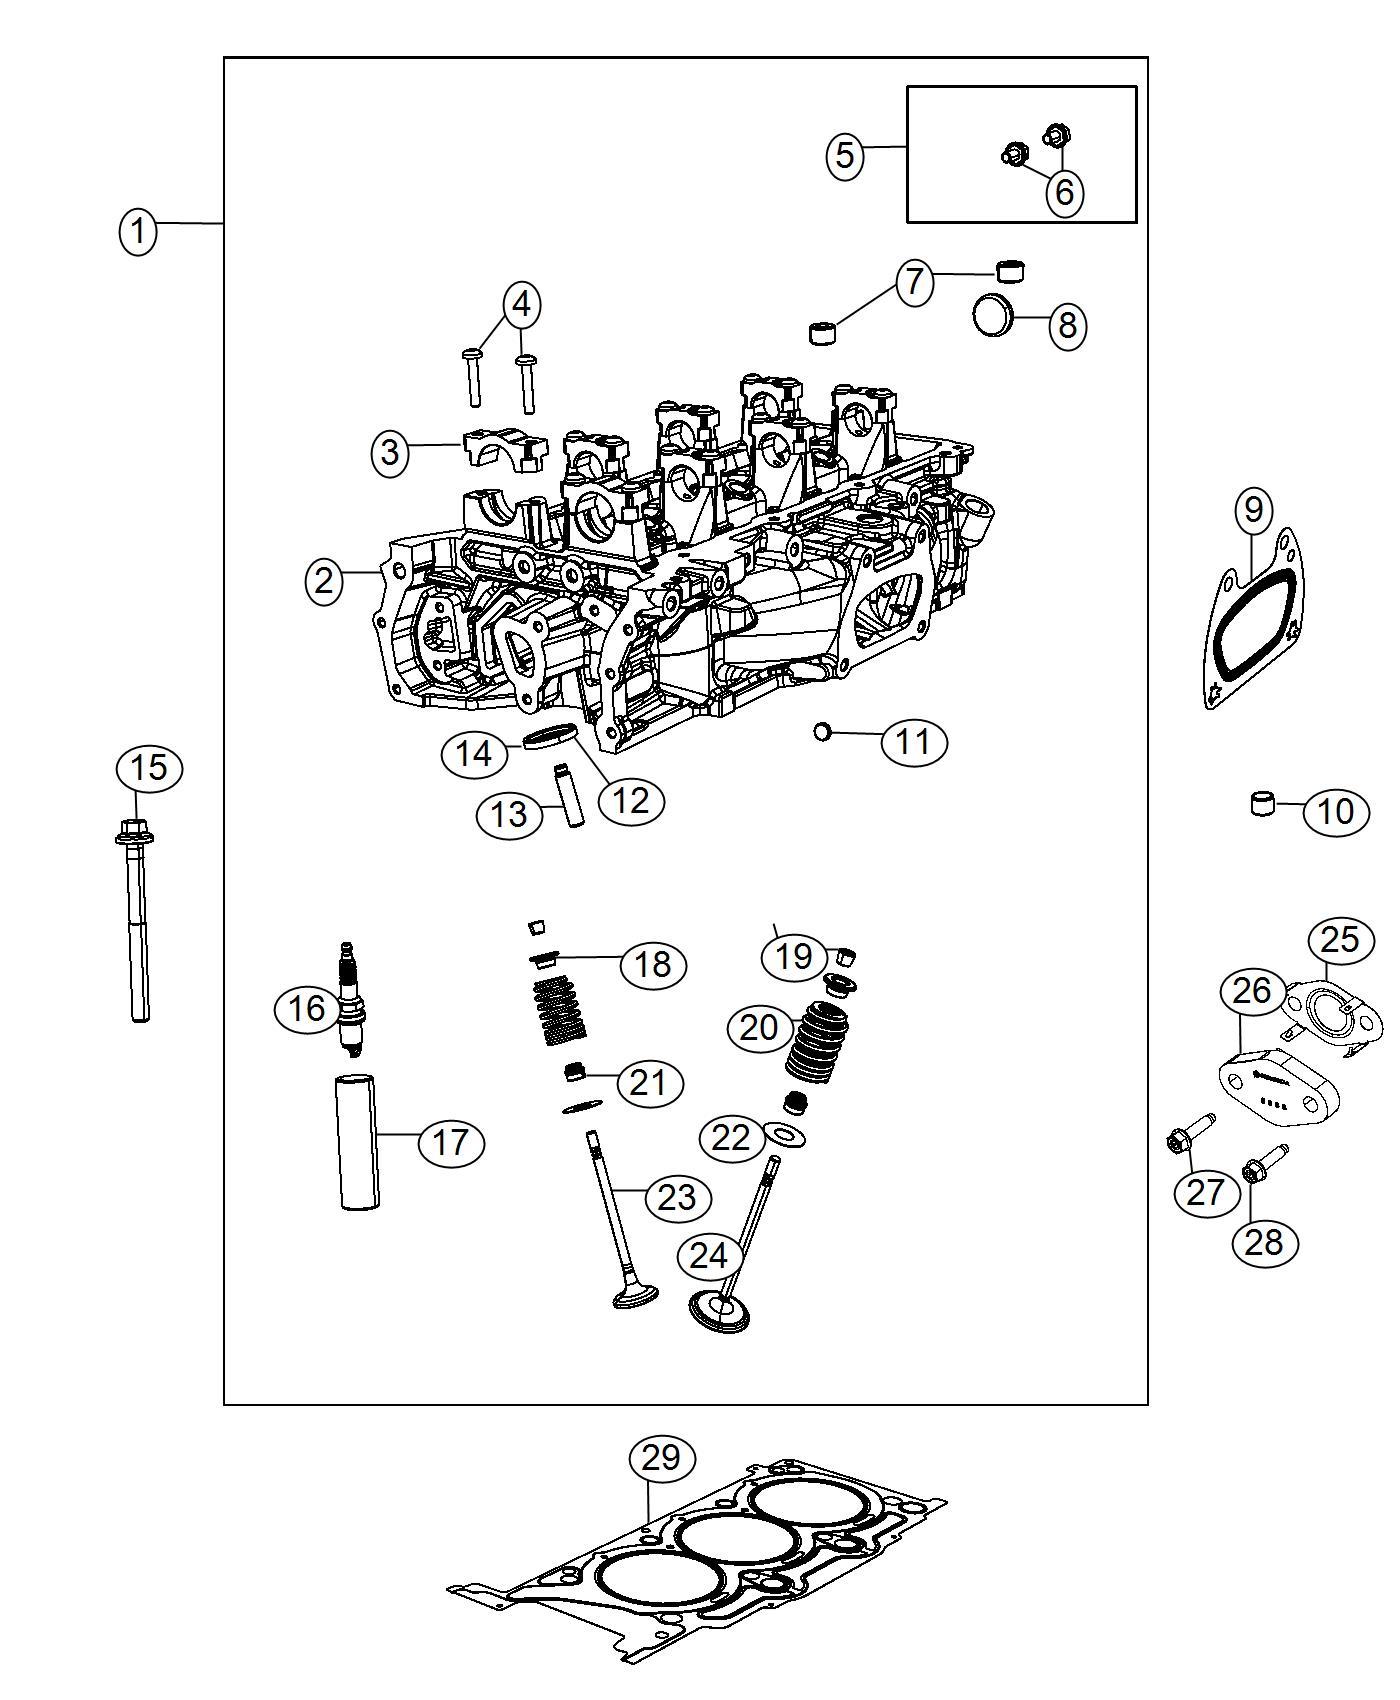 2016 jeep grand cherokee spark plug plugs ignition. Black Bedroom Furniture Sets. Home Design Ideas